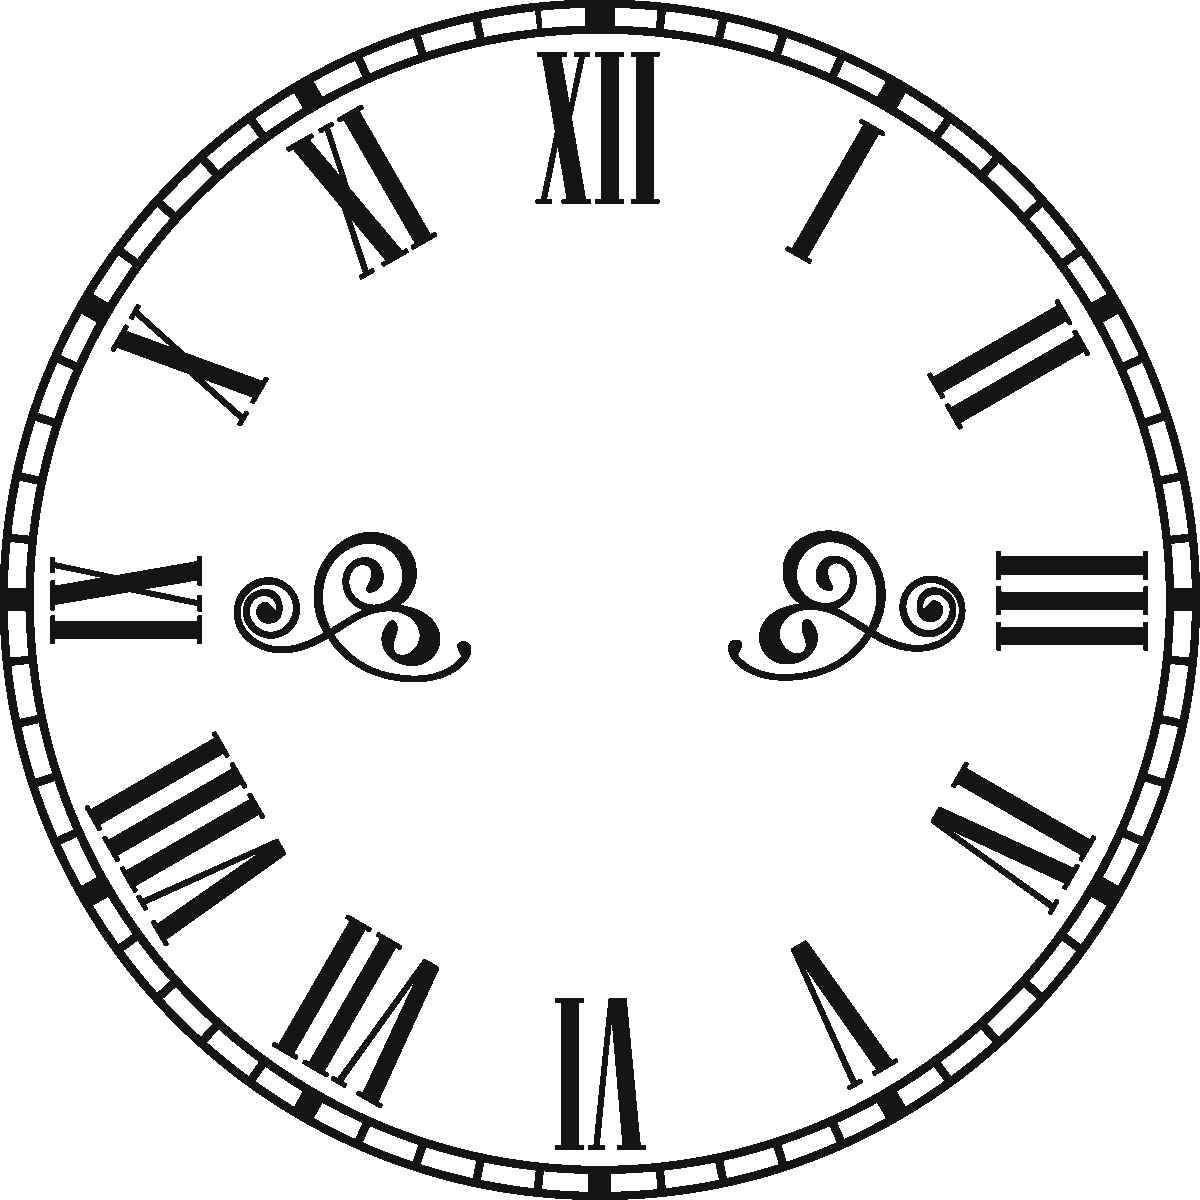 Gambar Jam Romawi